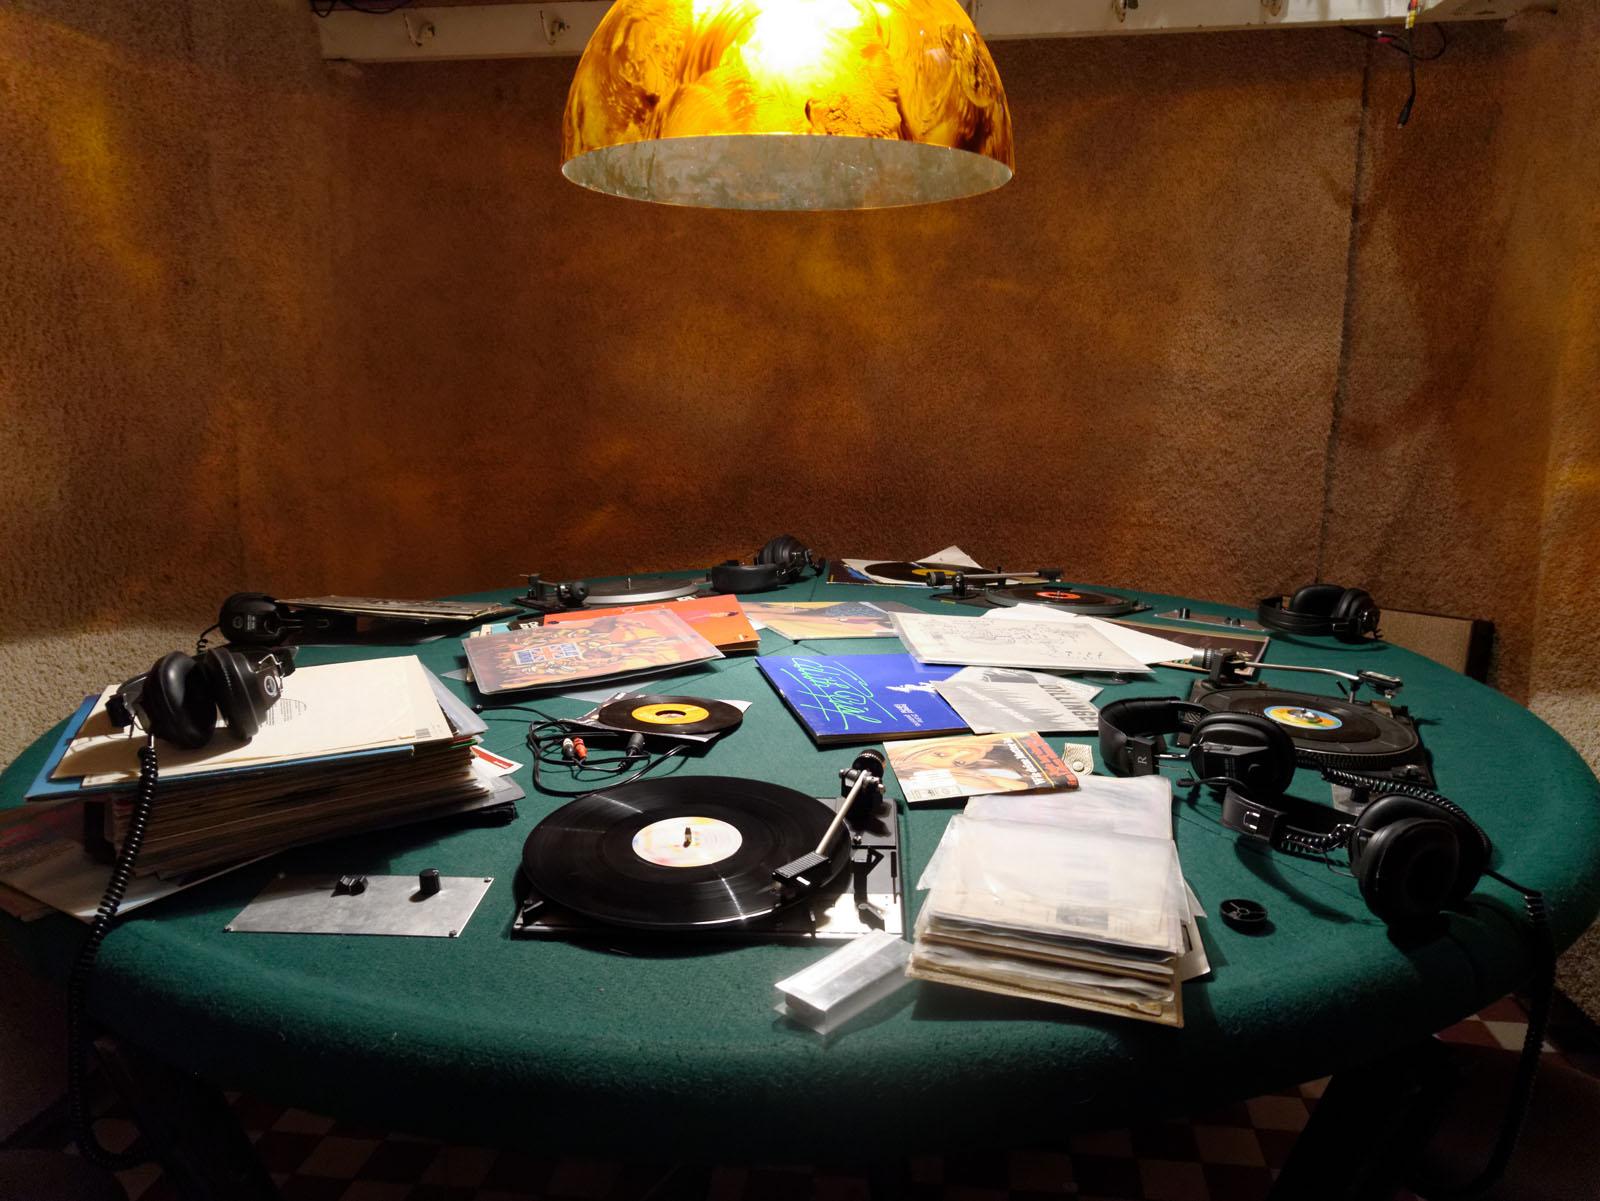 Lange Nacht der Museen Stuttgart - 77 Gare du Nord Roundtable DJing Vinyl